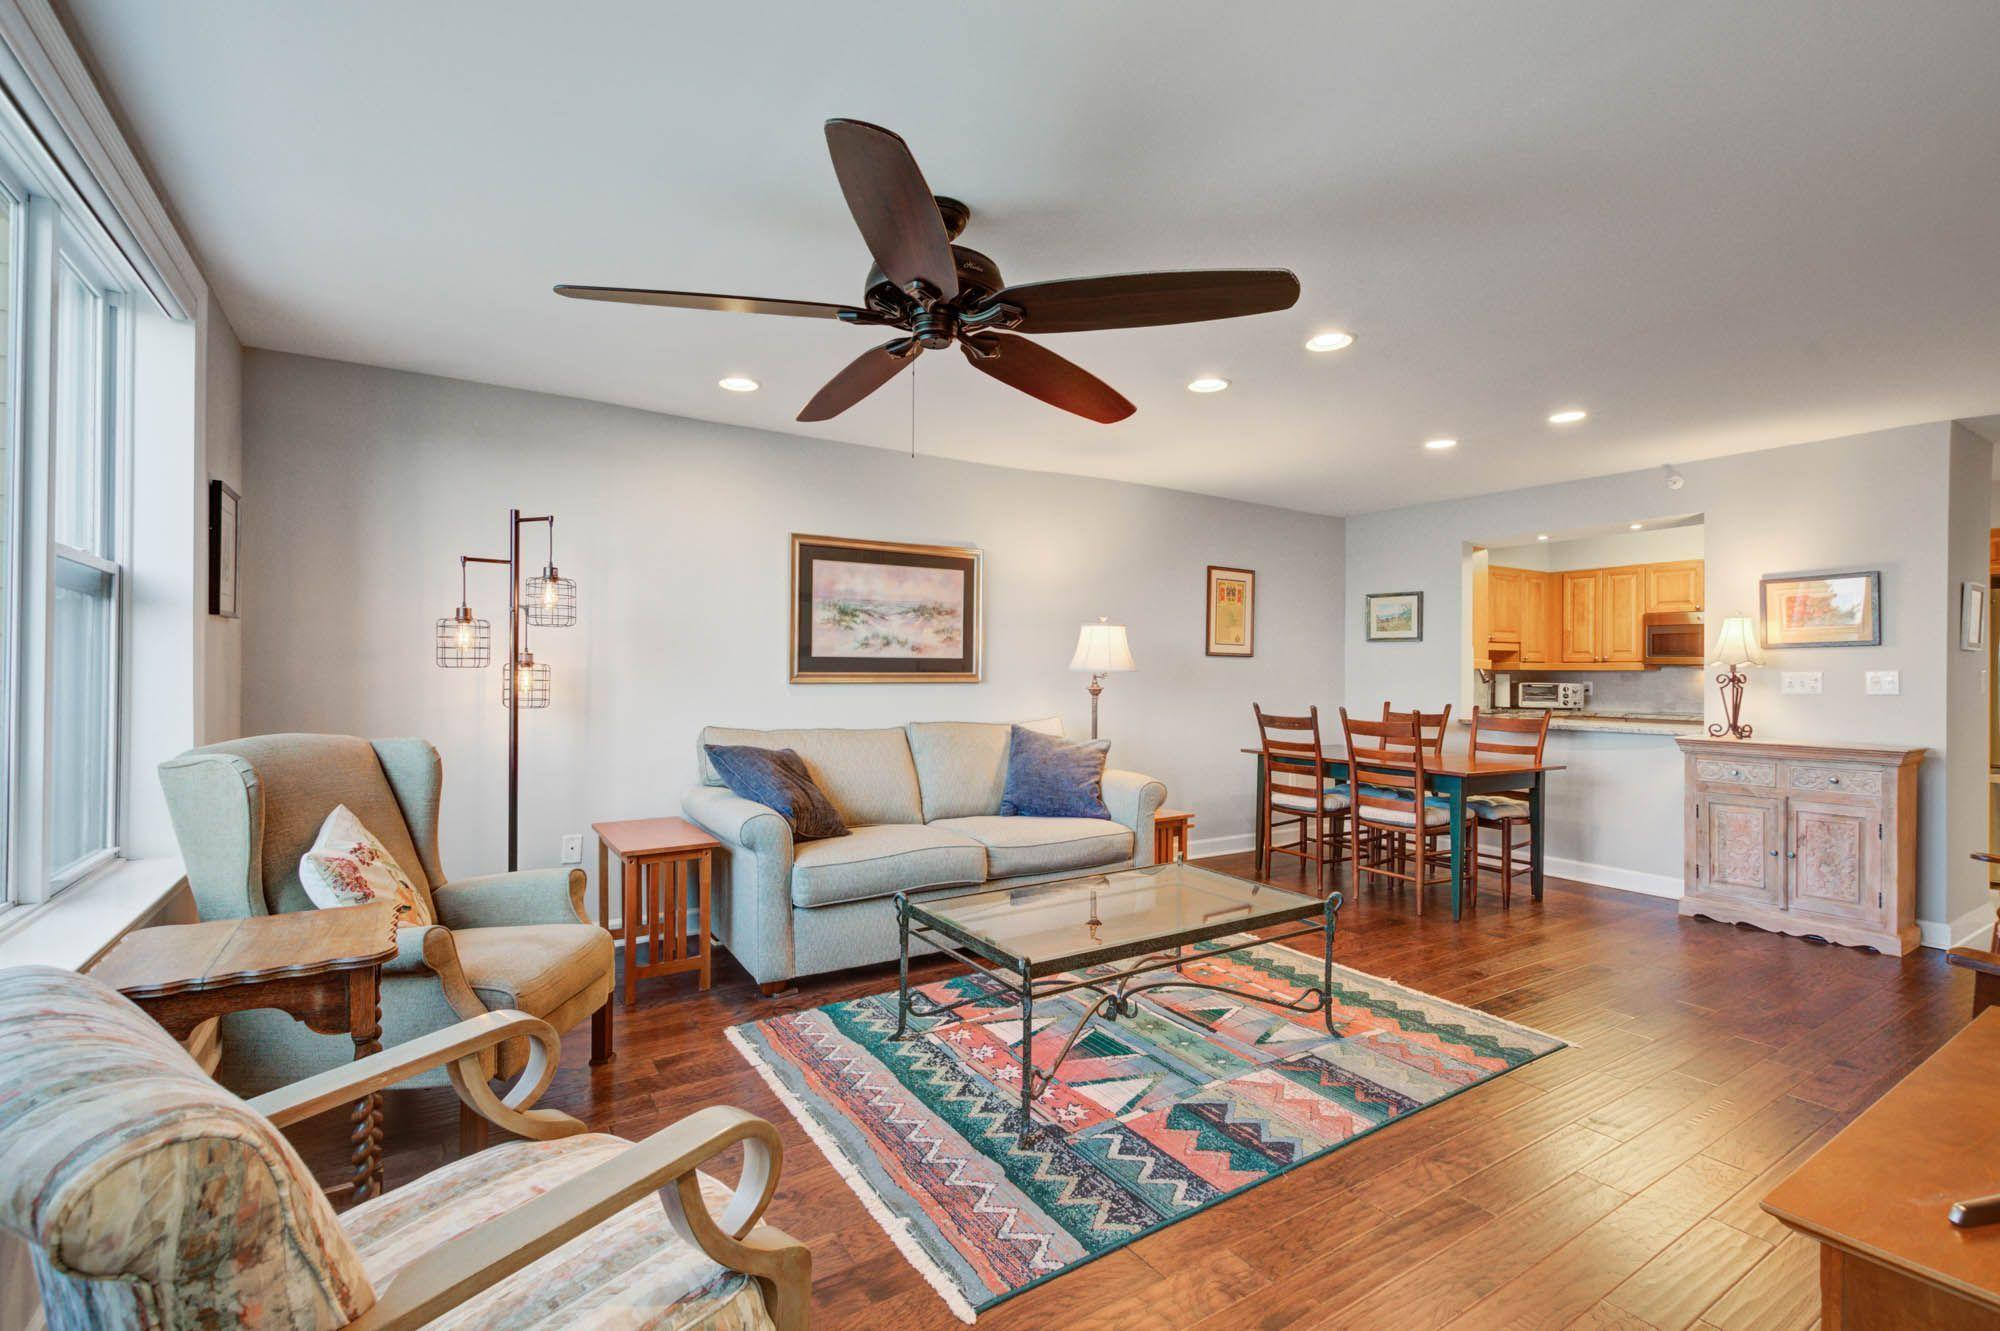 Turn of River Homes For Sale - 2395 Folly, Folly Beach, SC - 30